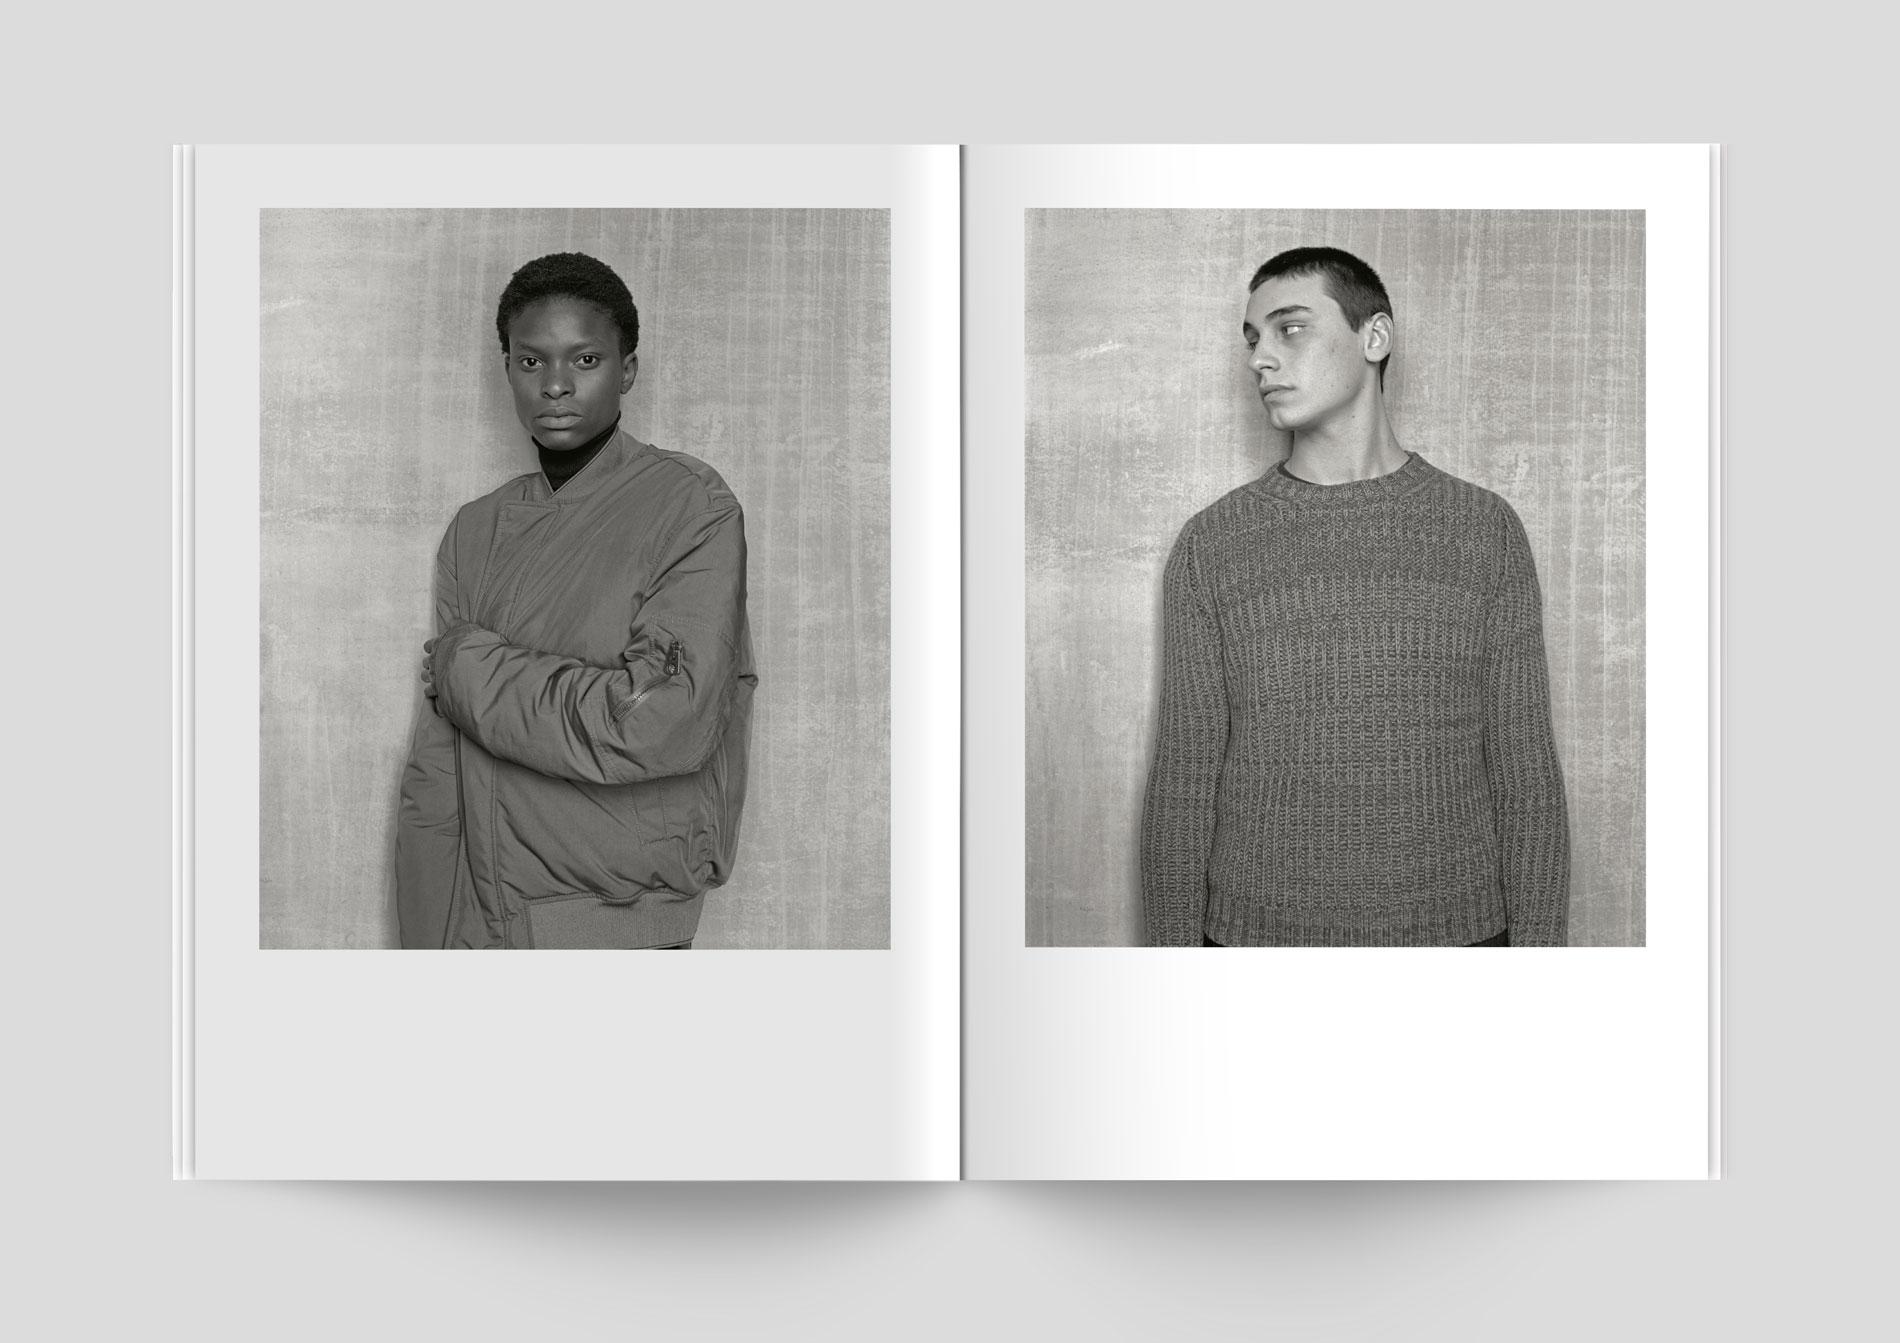 Santoni-Edited-by-Marco-Zanini-Ingar-Krauss-09